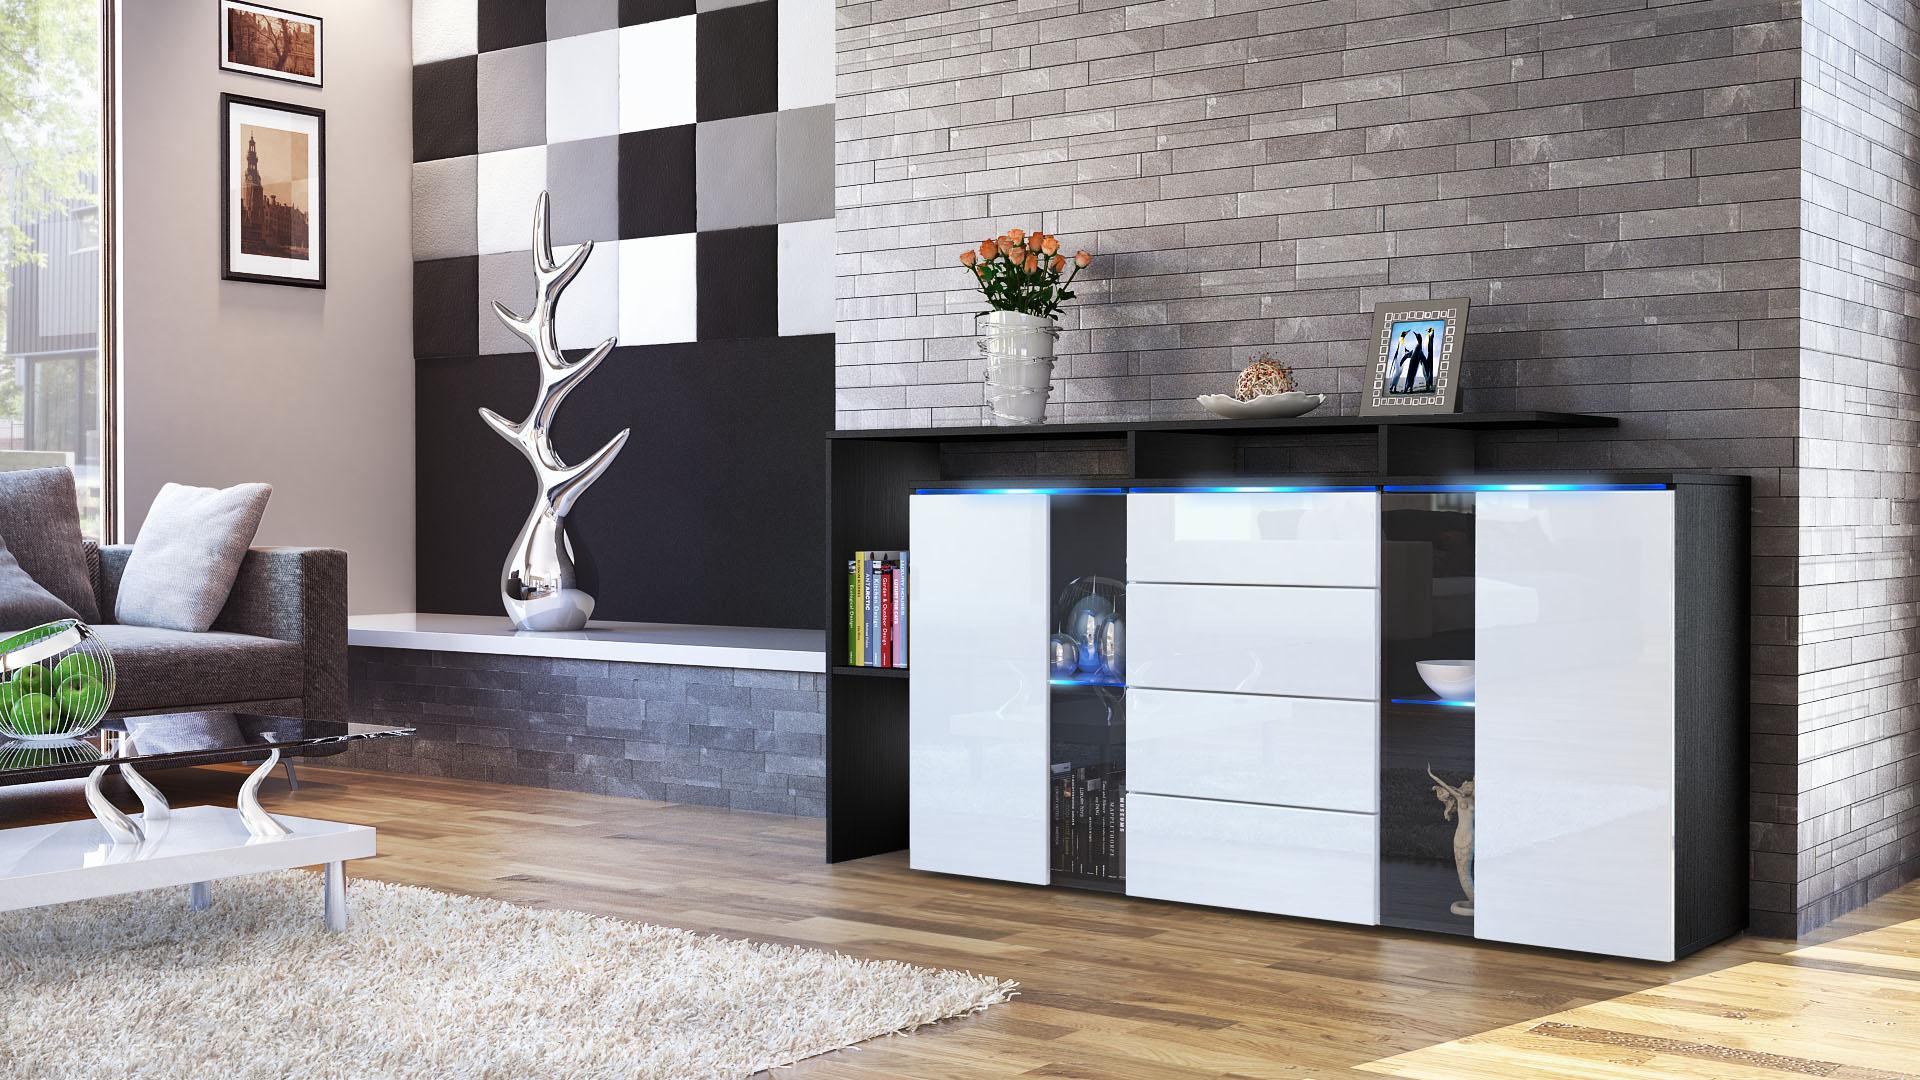 sideboard chest of drawers lissabon black matt high gloss natural tones ebay. Black Bedroom Furniture Sets. Home Design Ideas